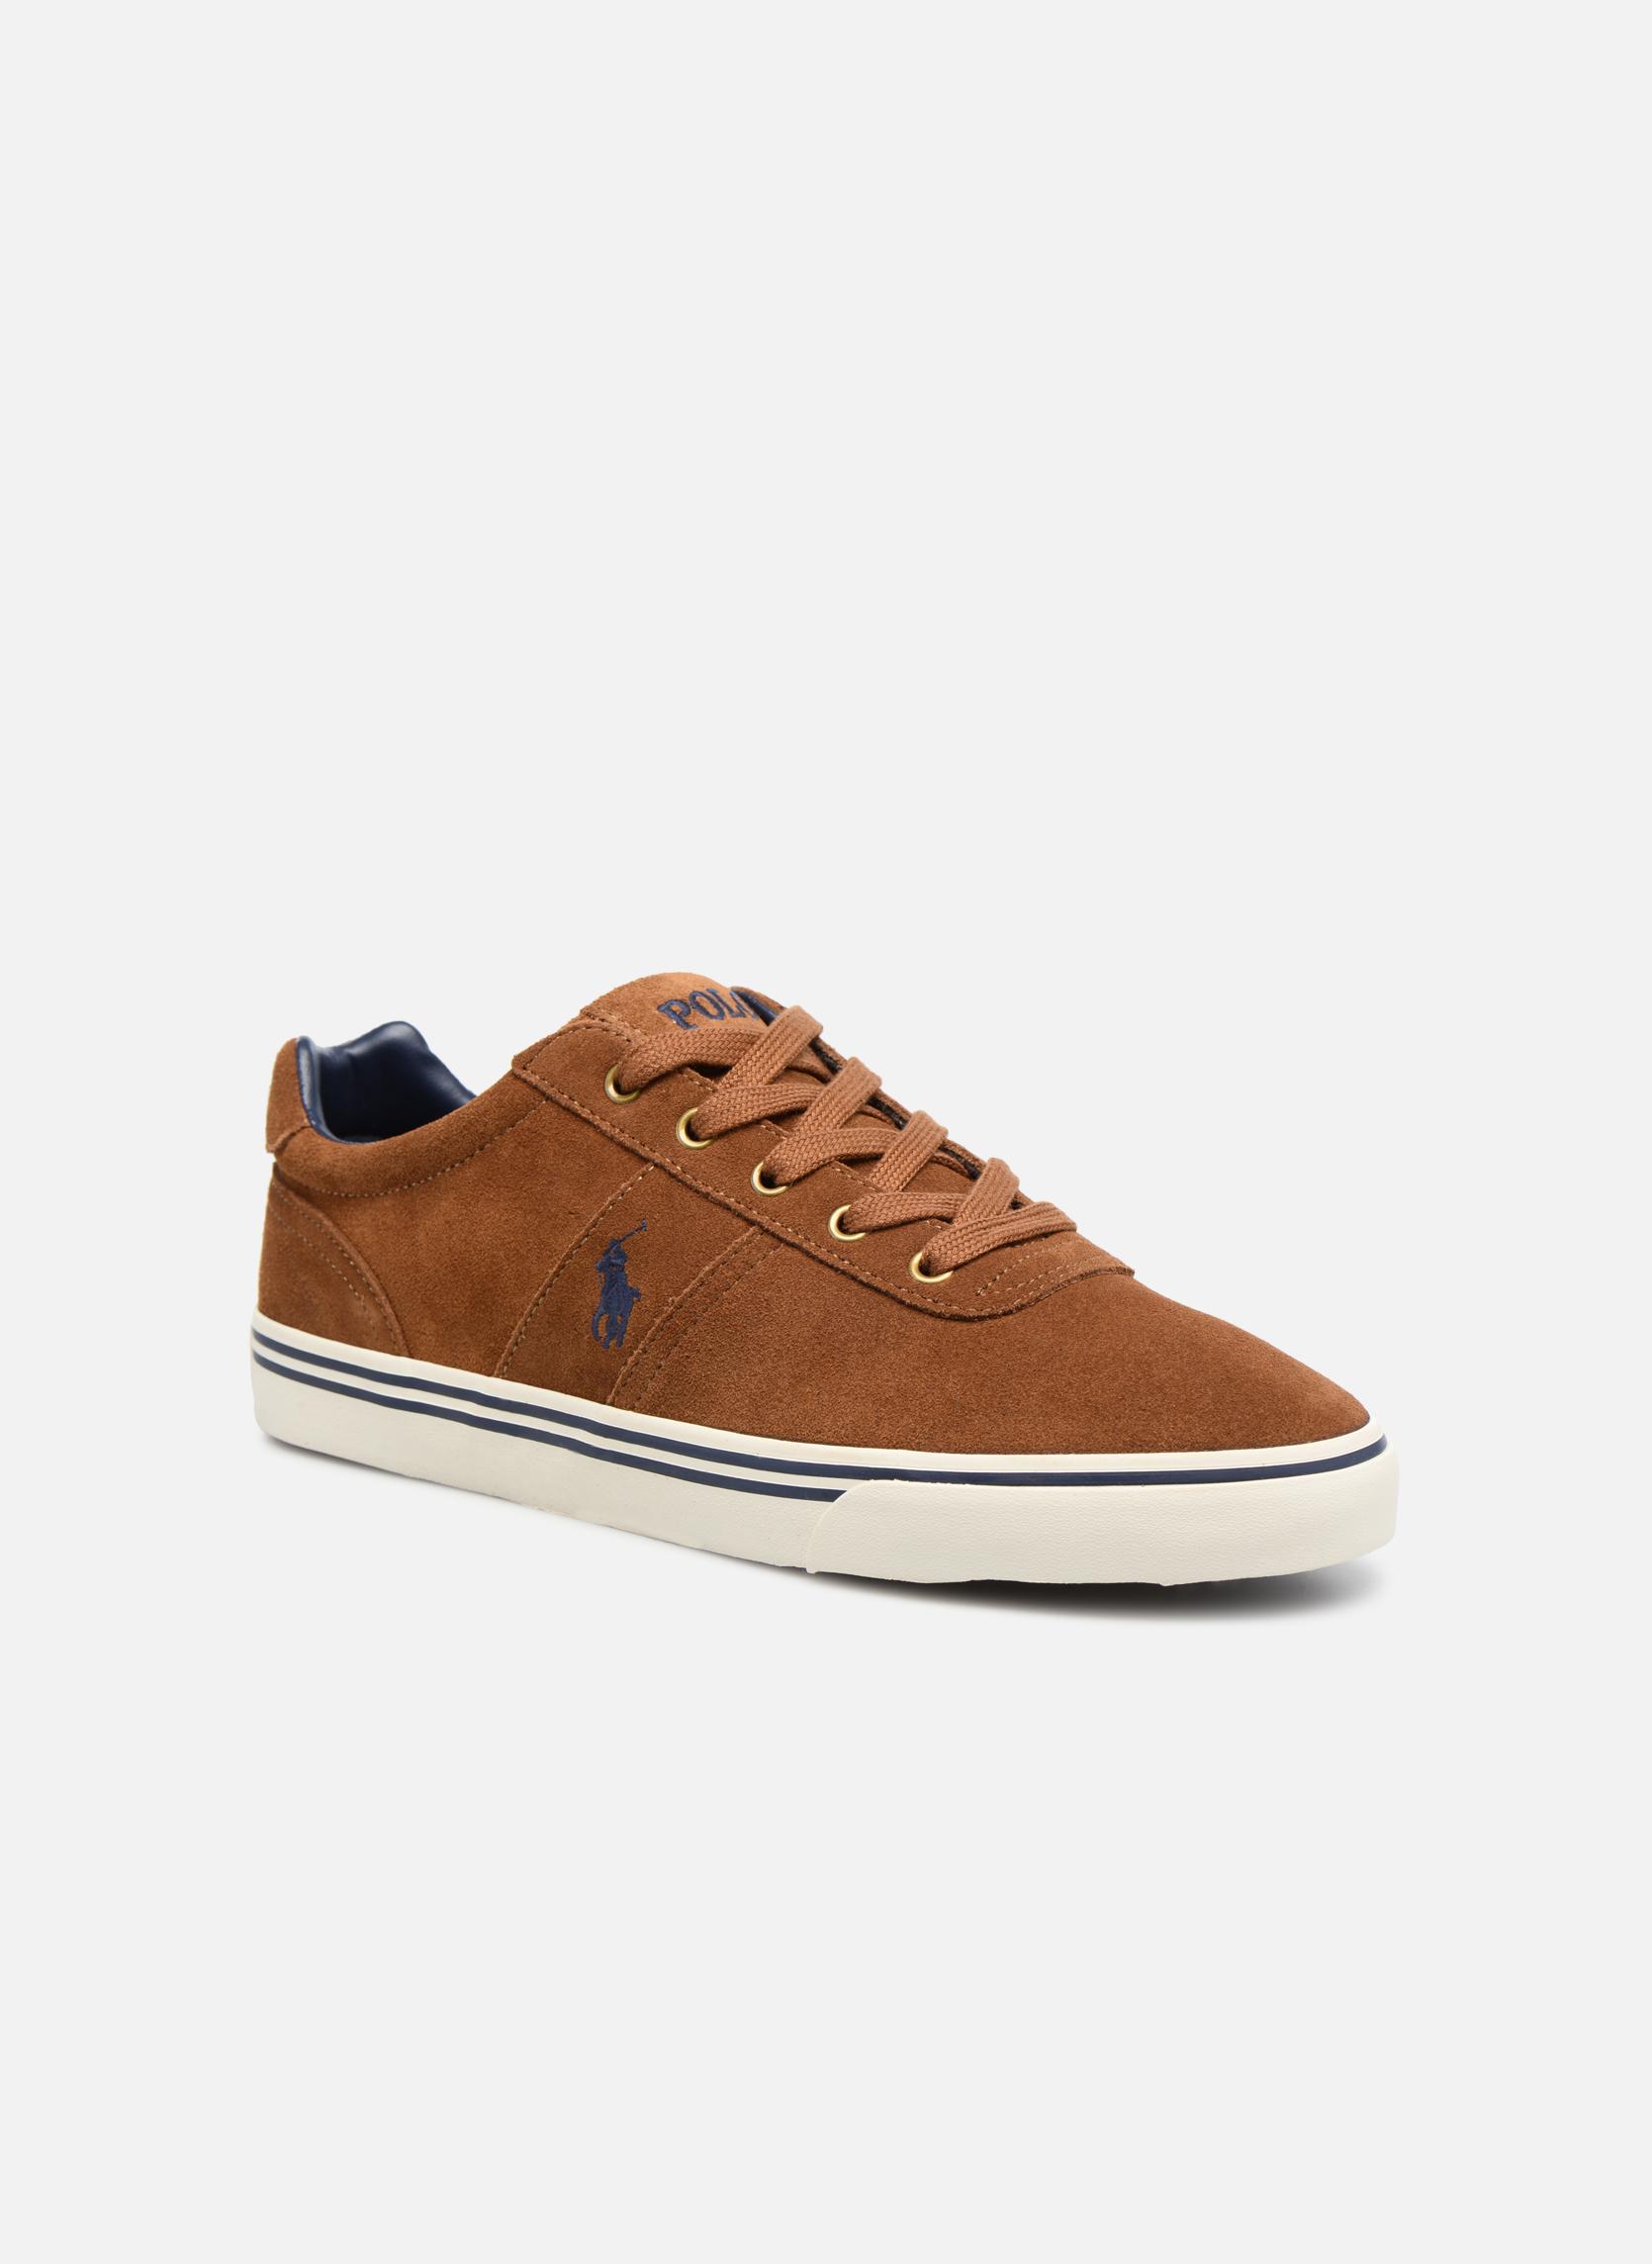 Polo Ralph Lauren Hanford-Sneakers-Vulc